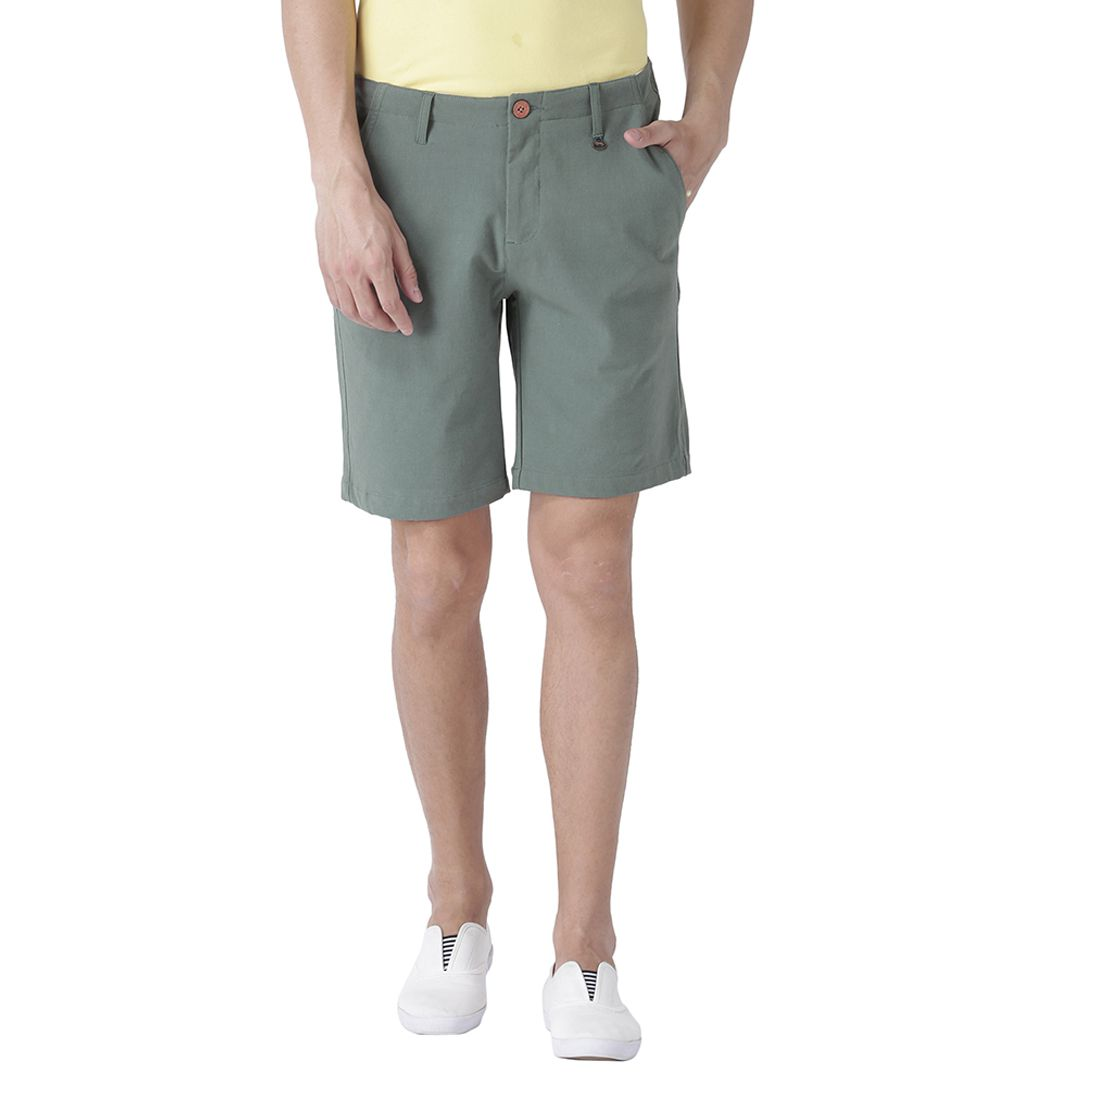 JUMP USA Grey Shorts